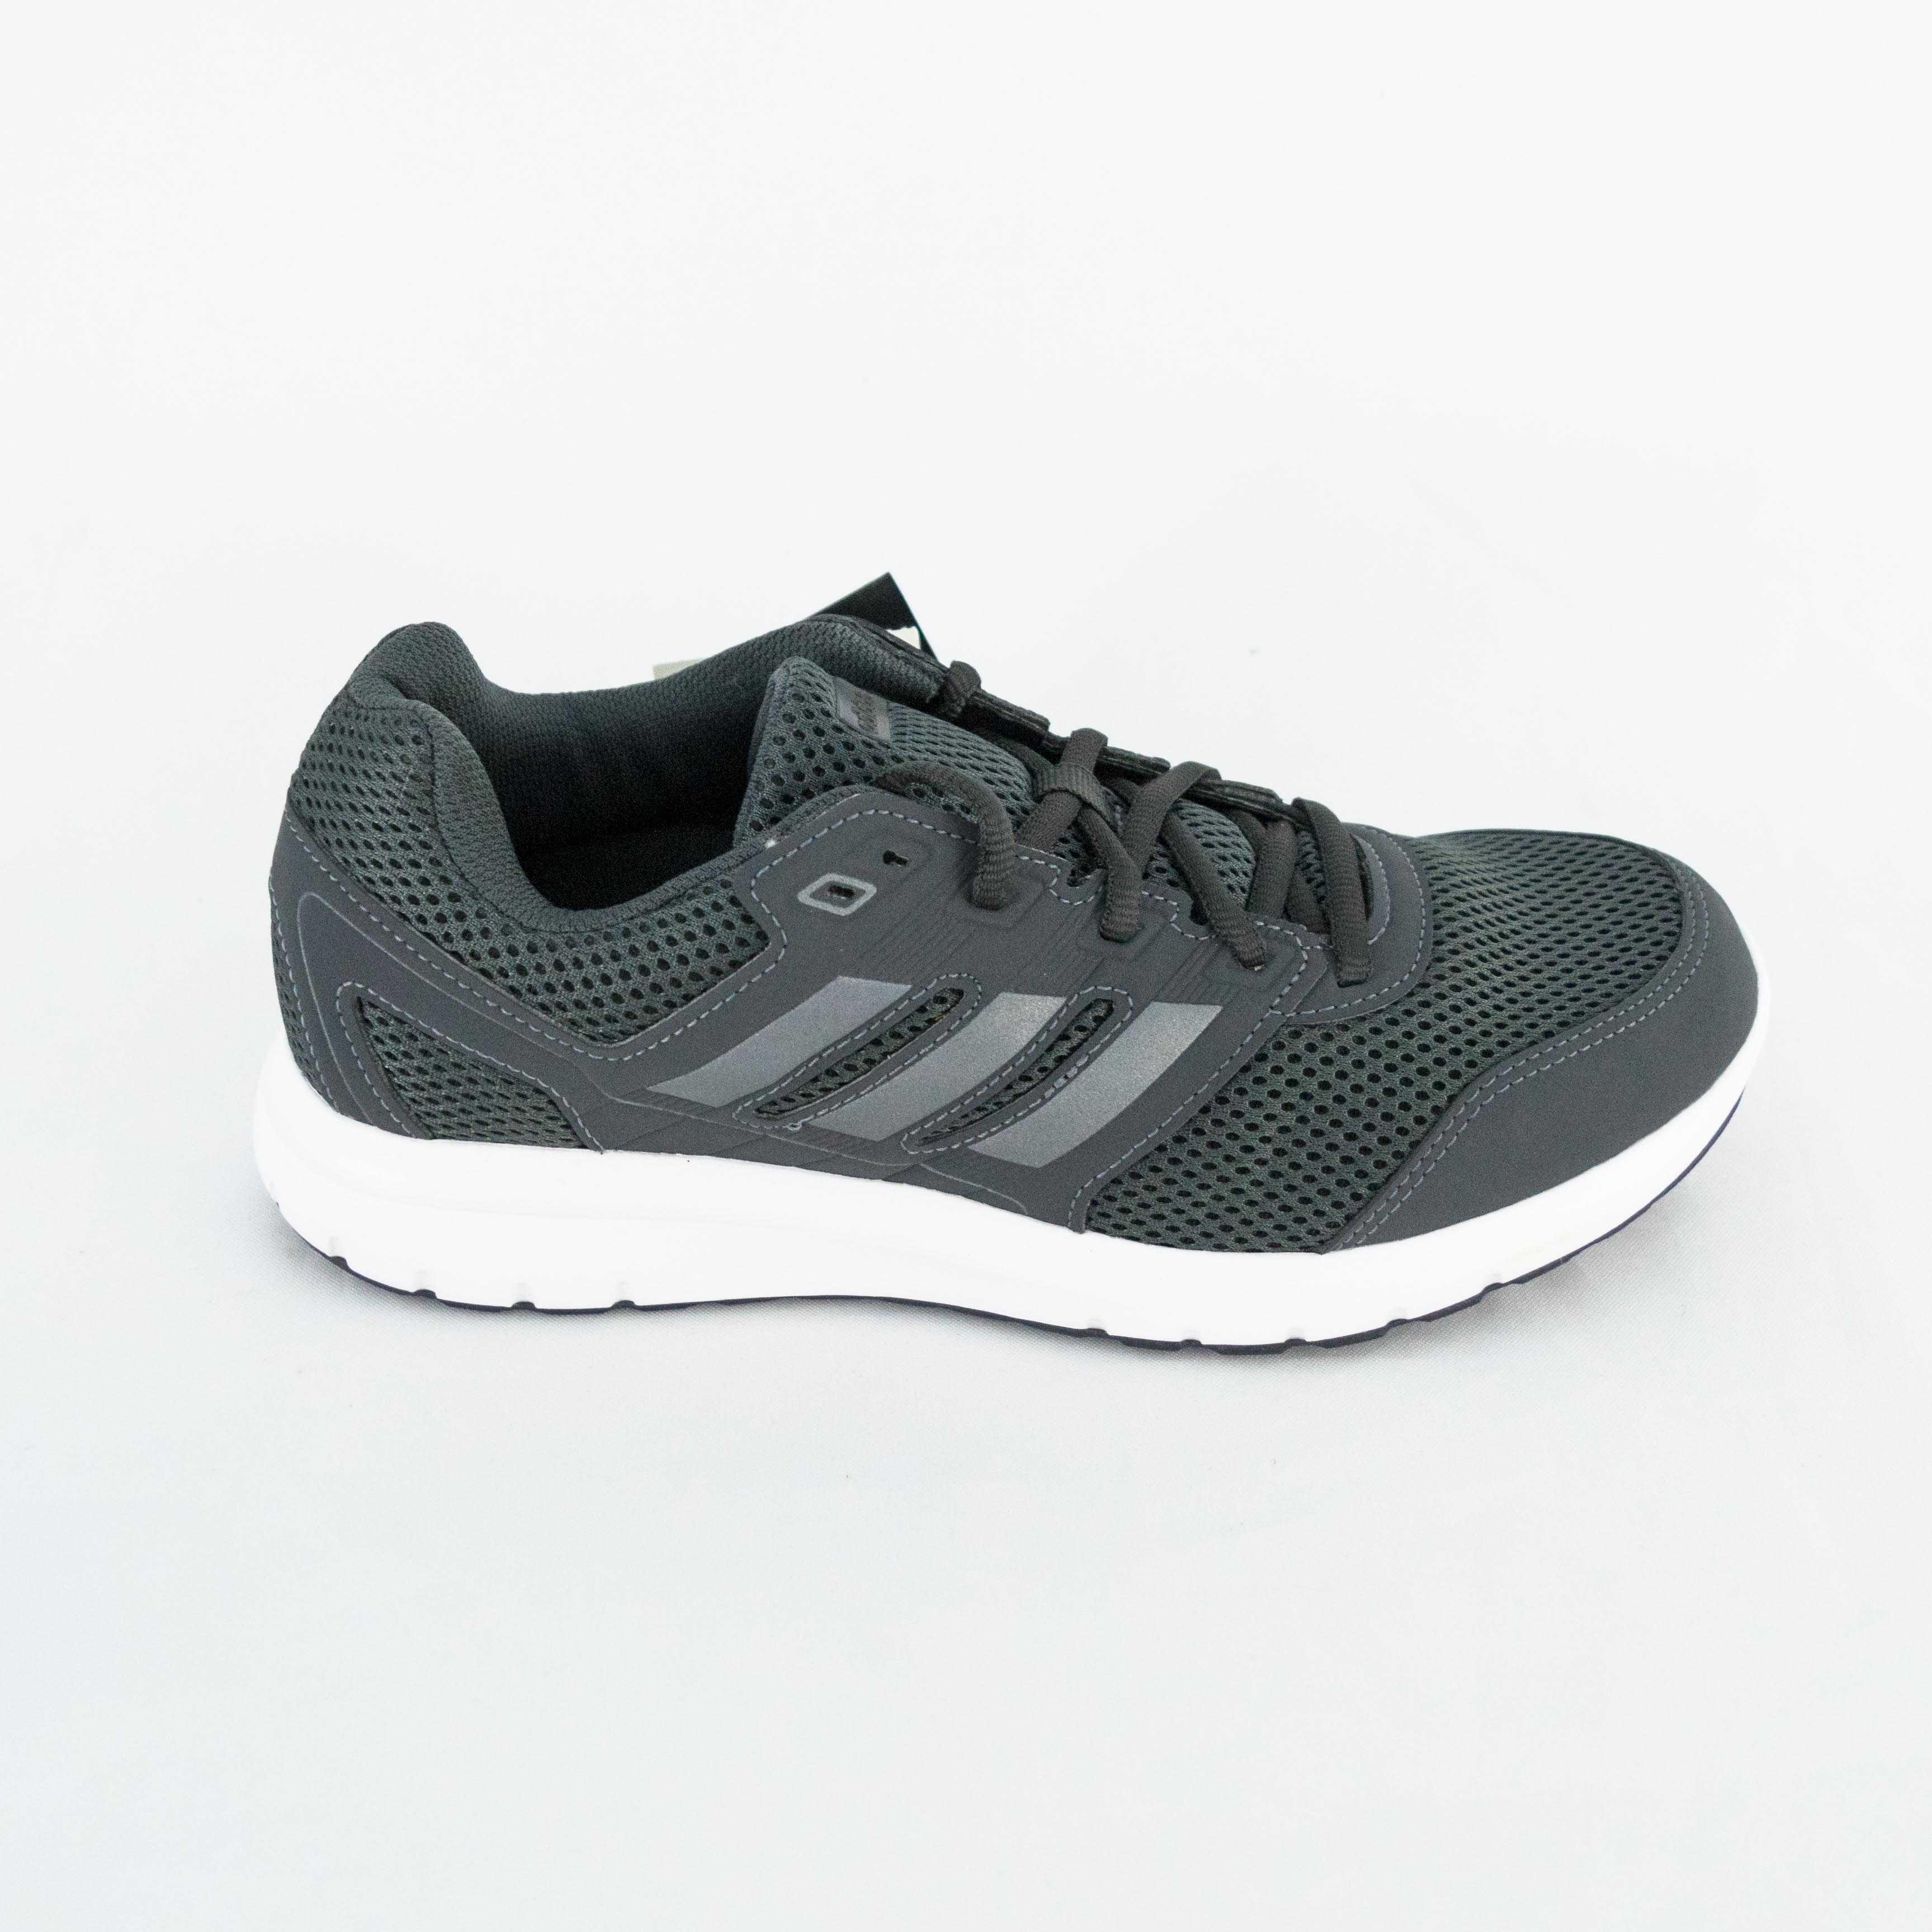 Tênis Adidas CG4044 Duramo Lite 2.0 Cinza